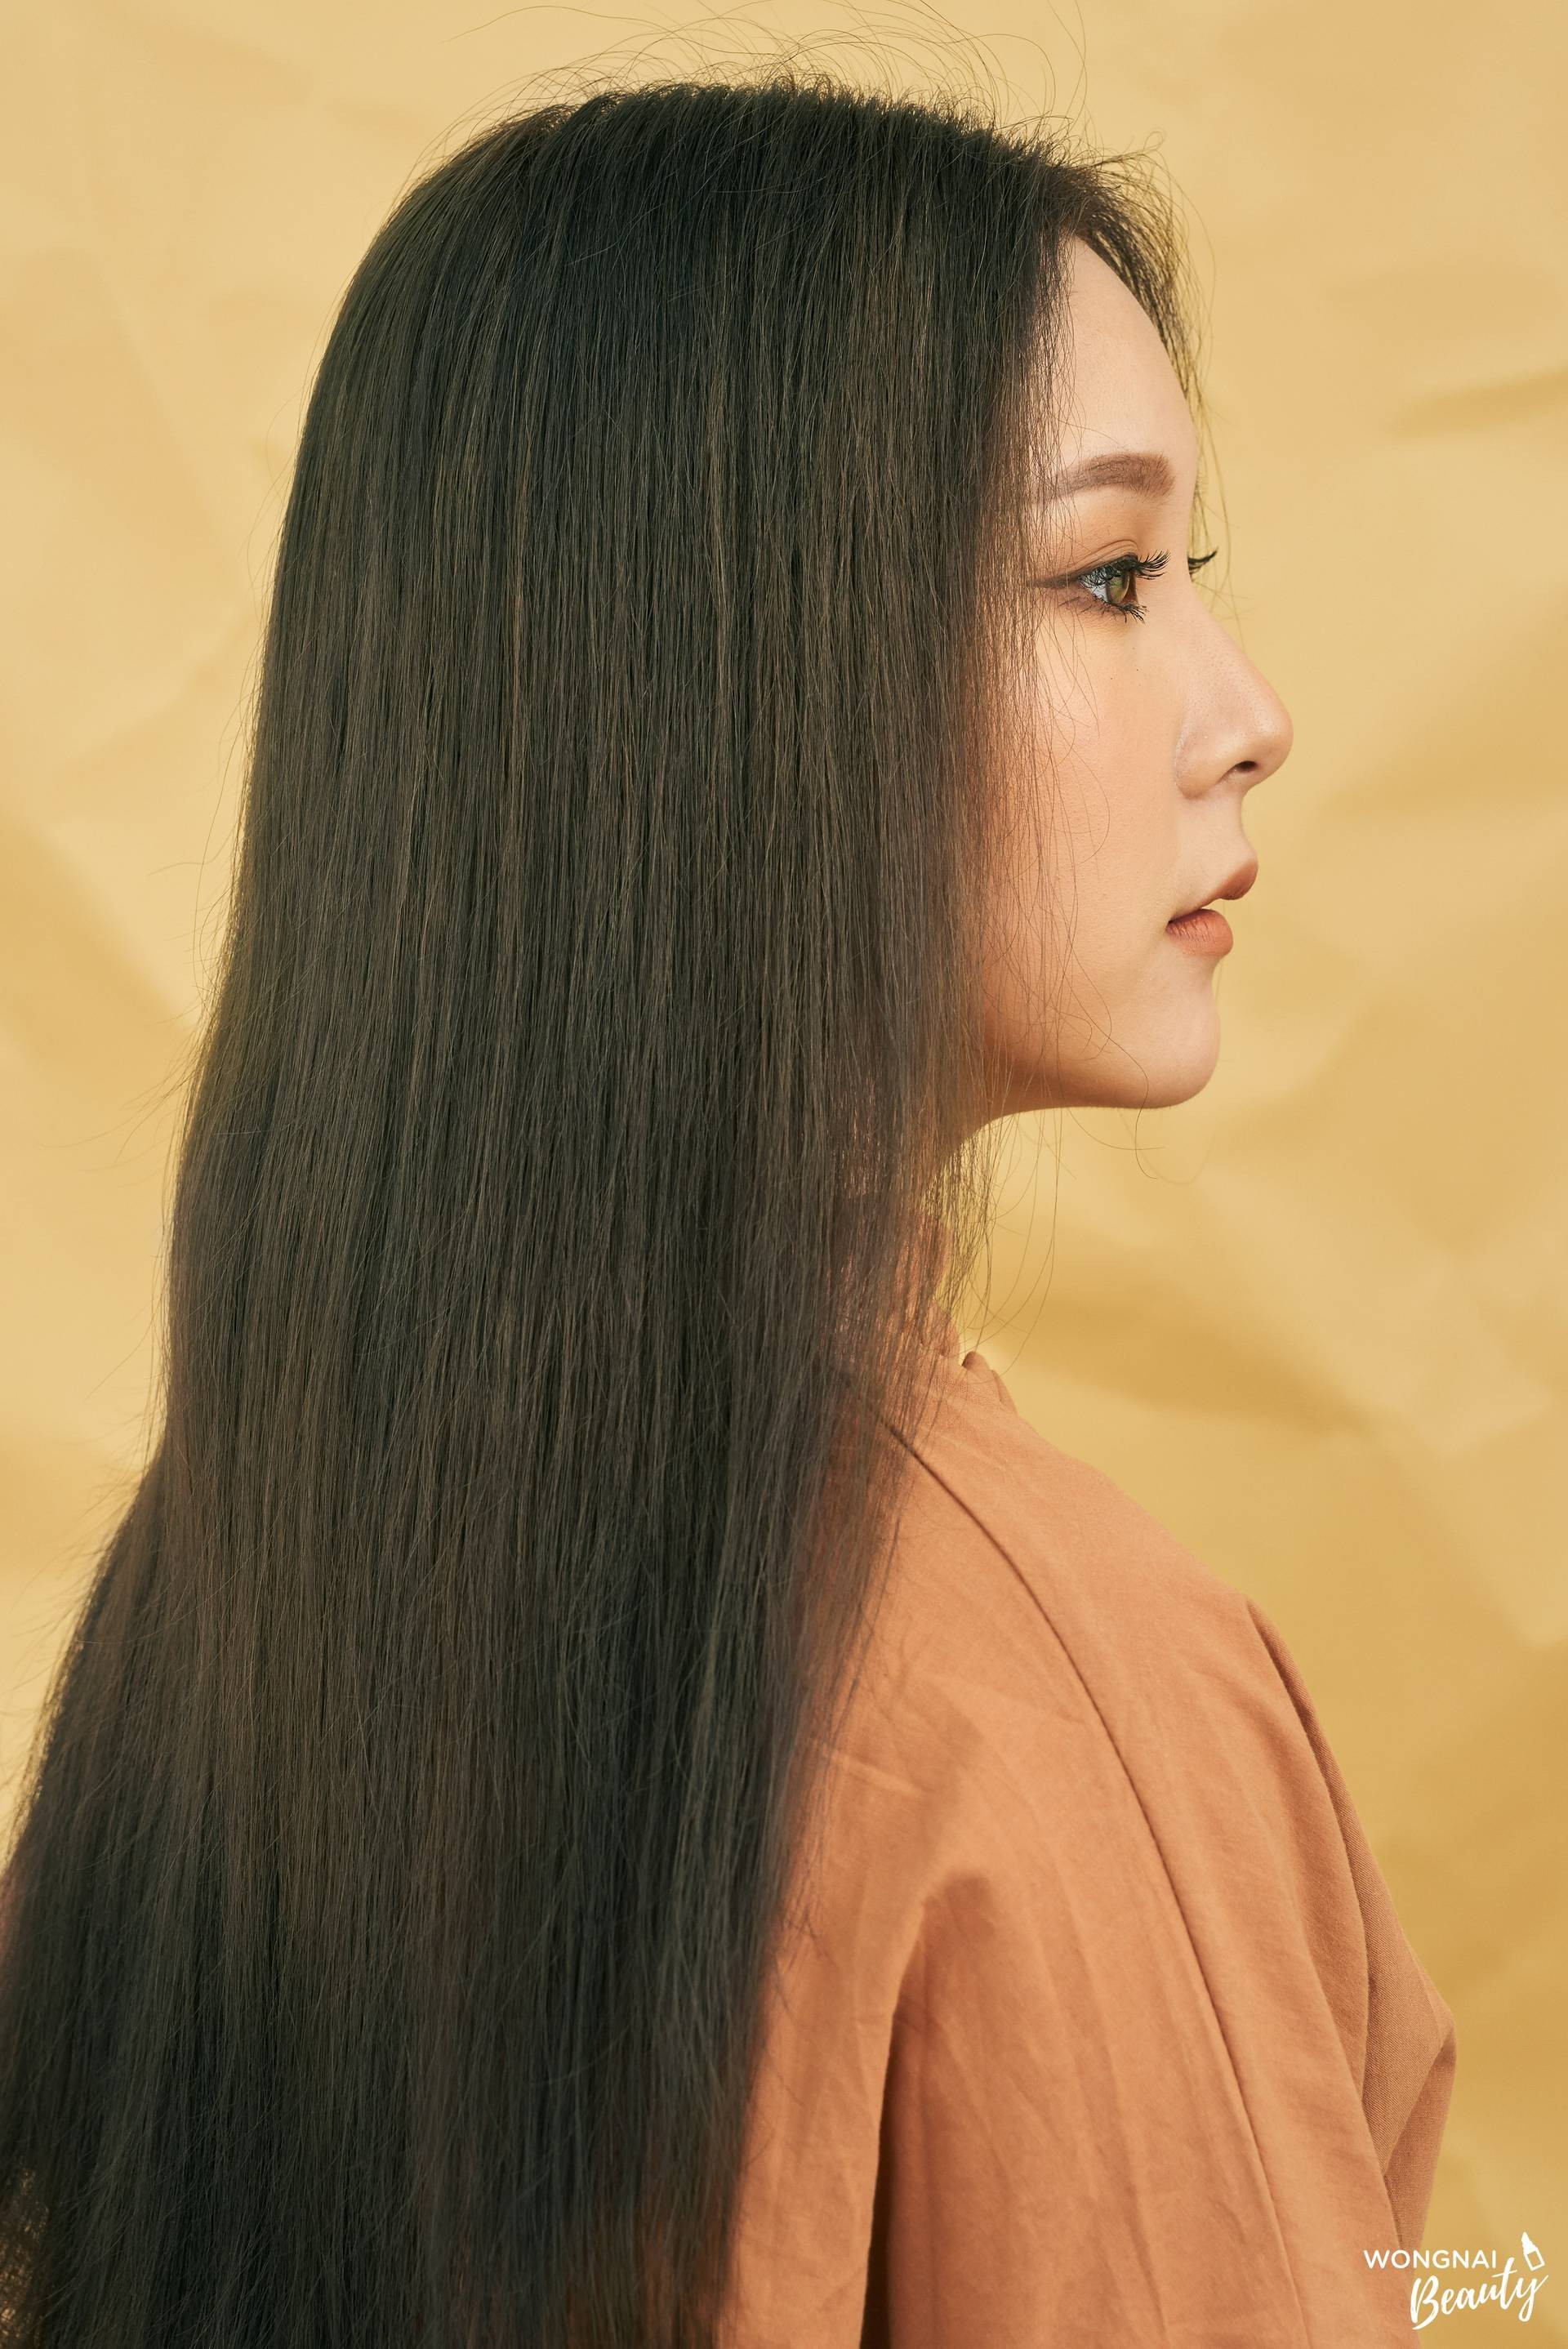 The Cortice Hair Salon